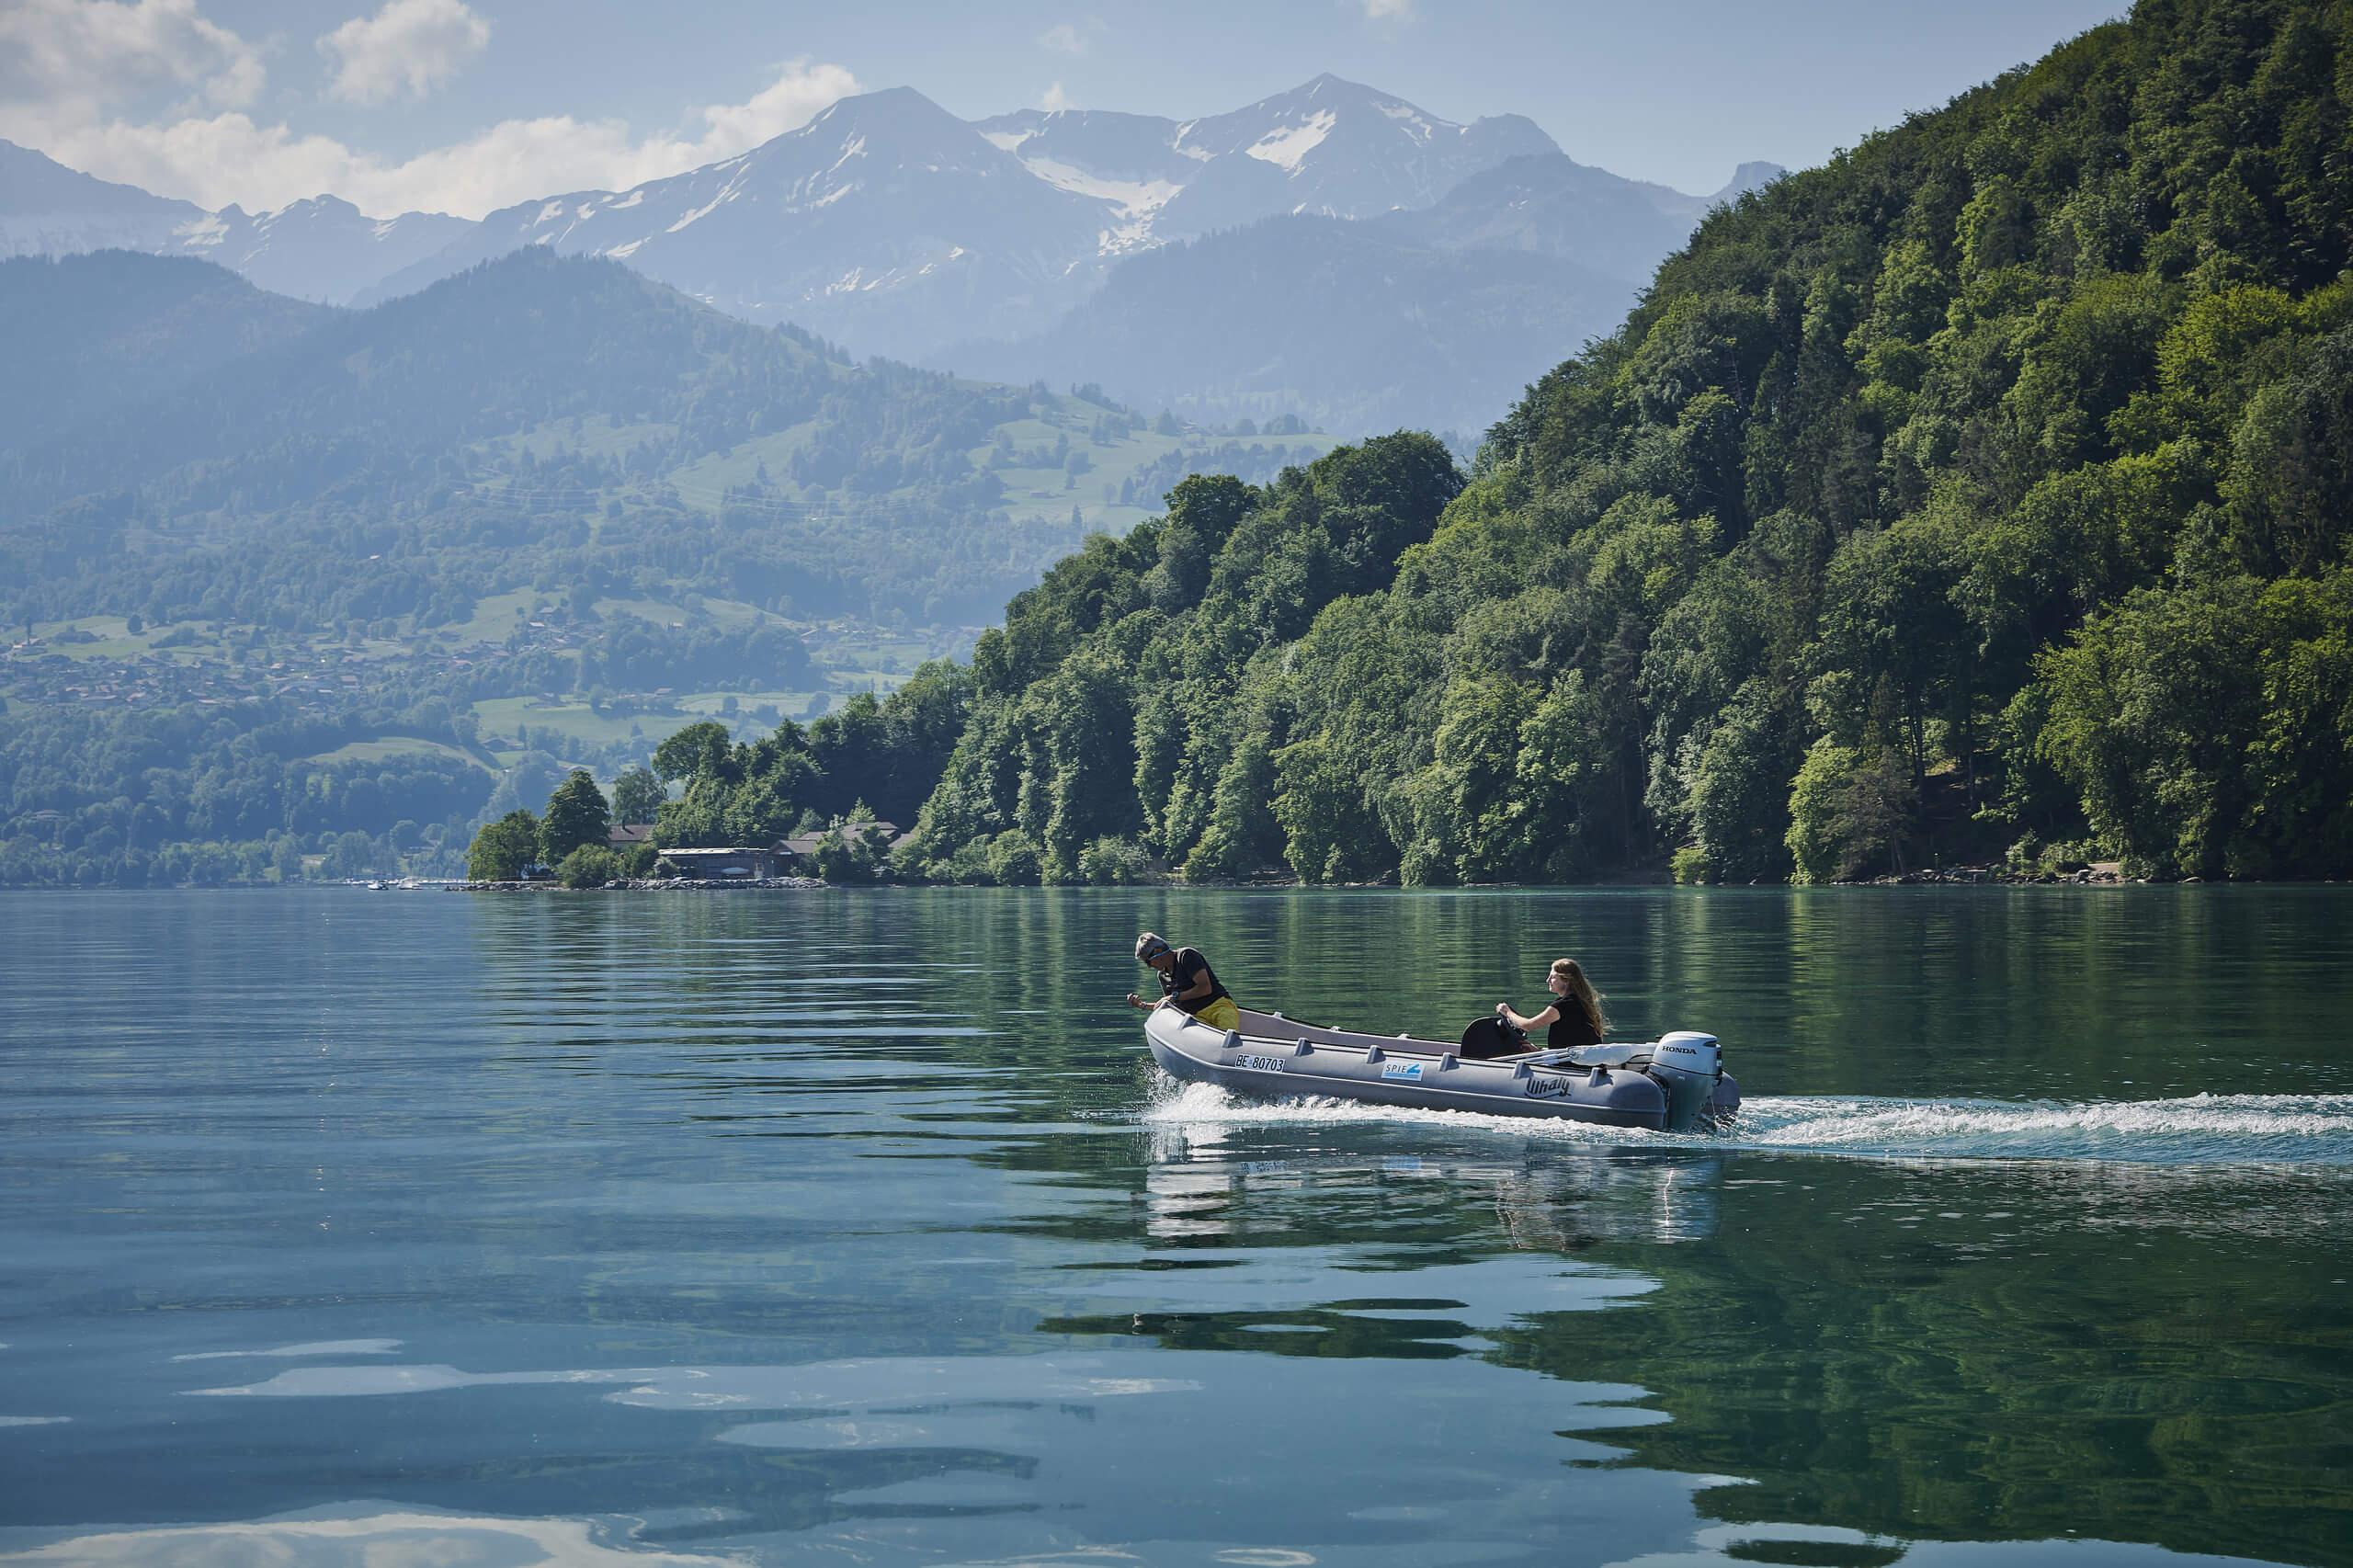 faulensee-thunersee-motorboot-wasser-sommer-alpen